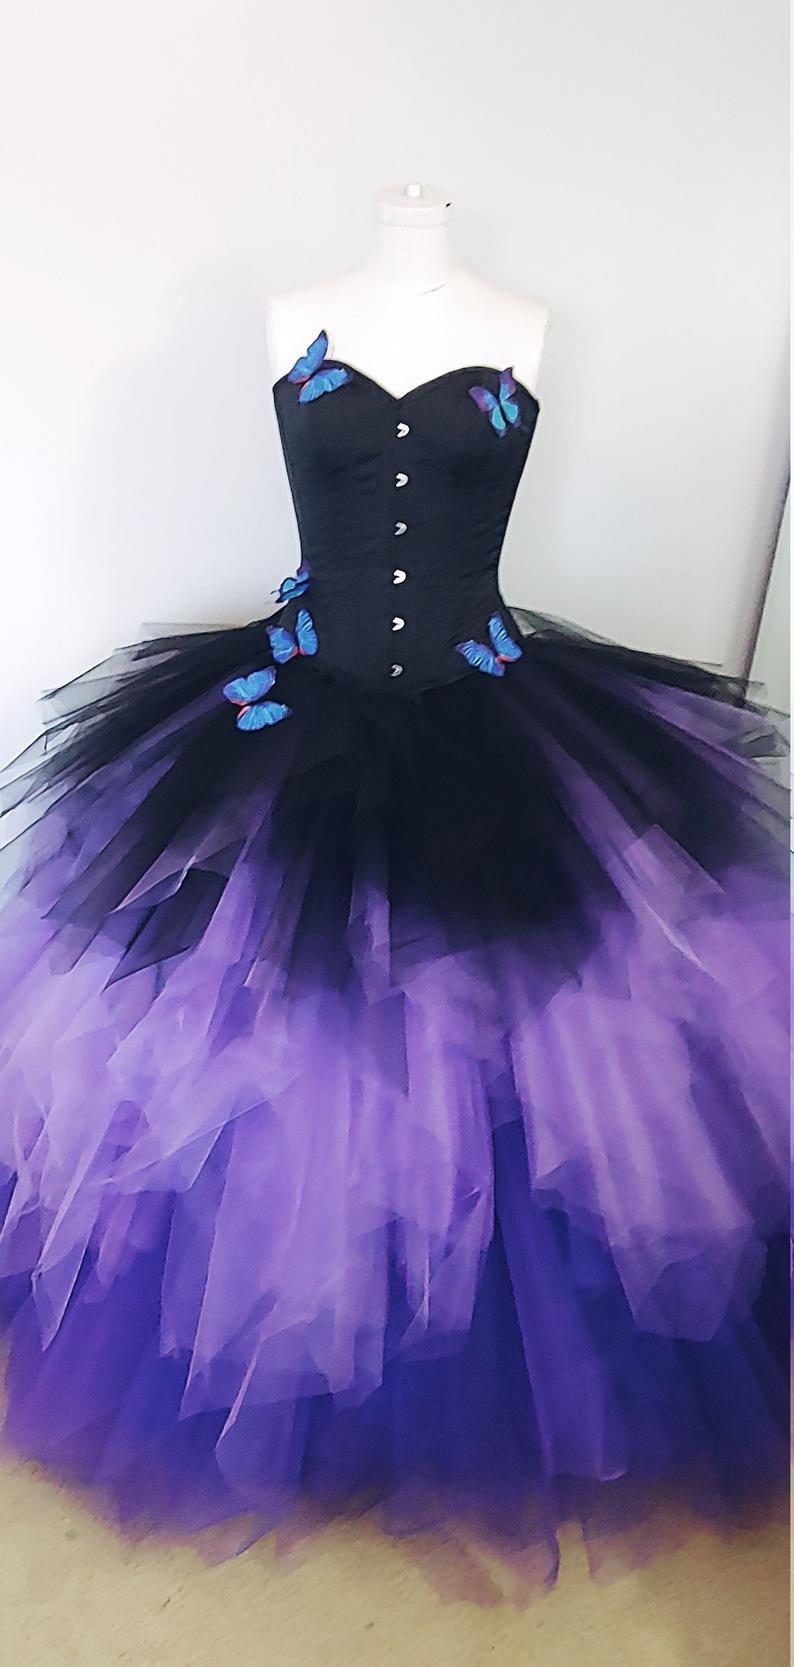 Black Wedding Dress Ombre Bridal Gown Butterfly Dress Plus Etsy Black Wedding Dresses Old Wedding Dresses Etsy Wedding Dress [ 1667 x 794 Pixel ]